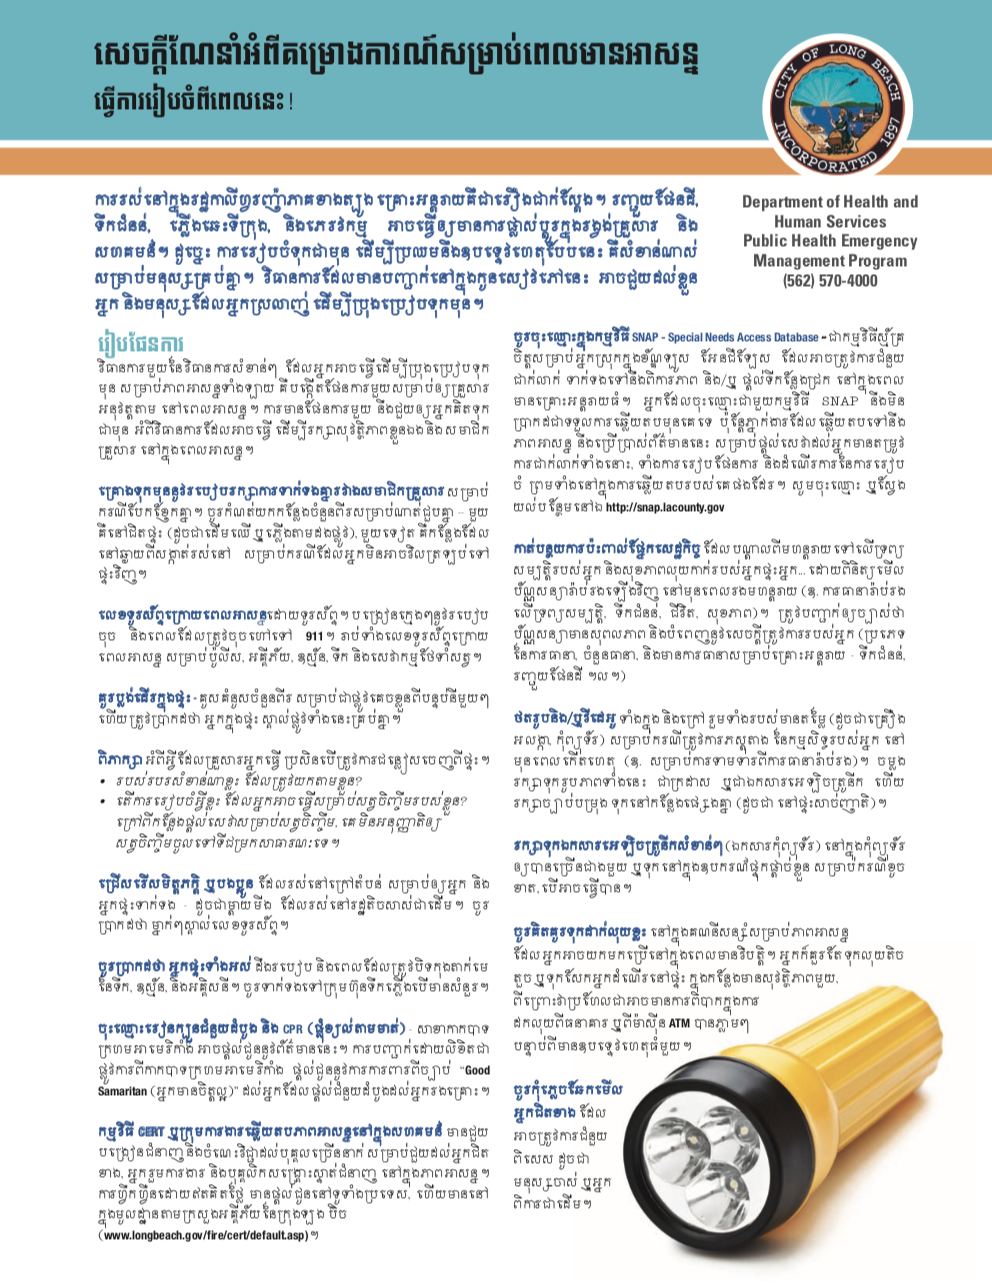 City of Long Beach, Emergency Planning Guide (Khmer)